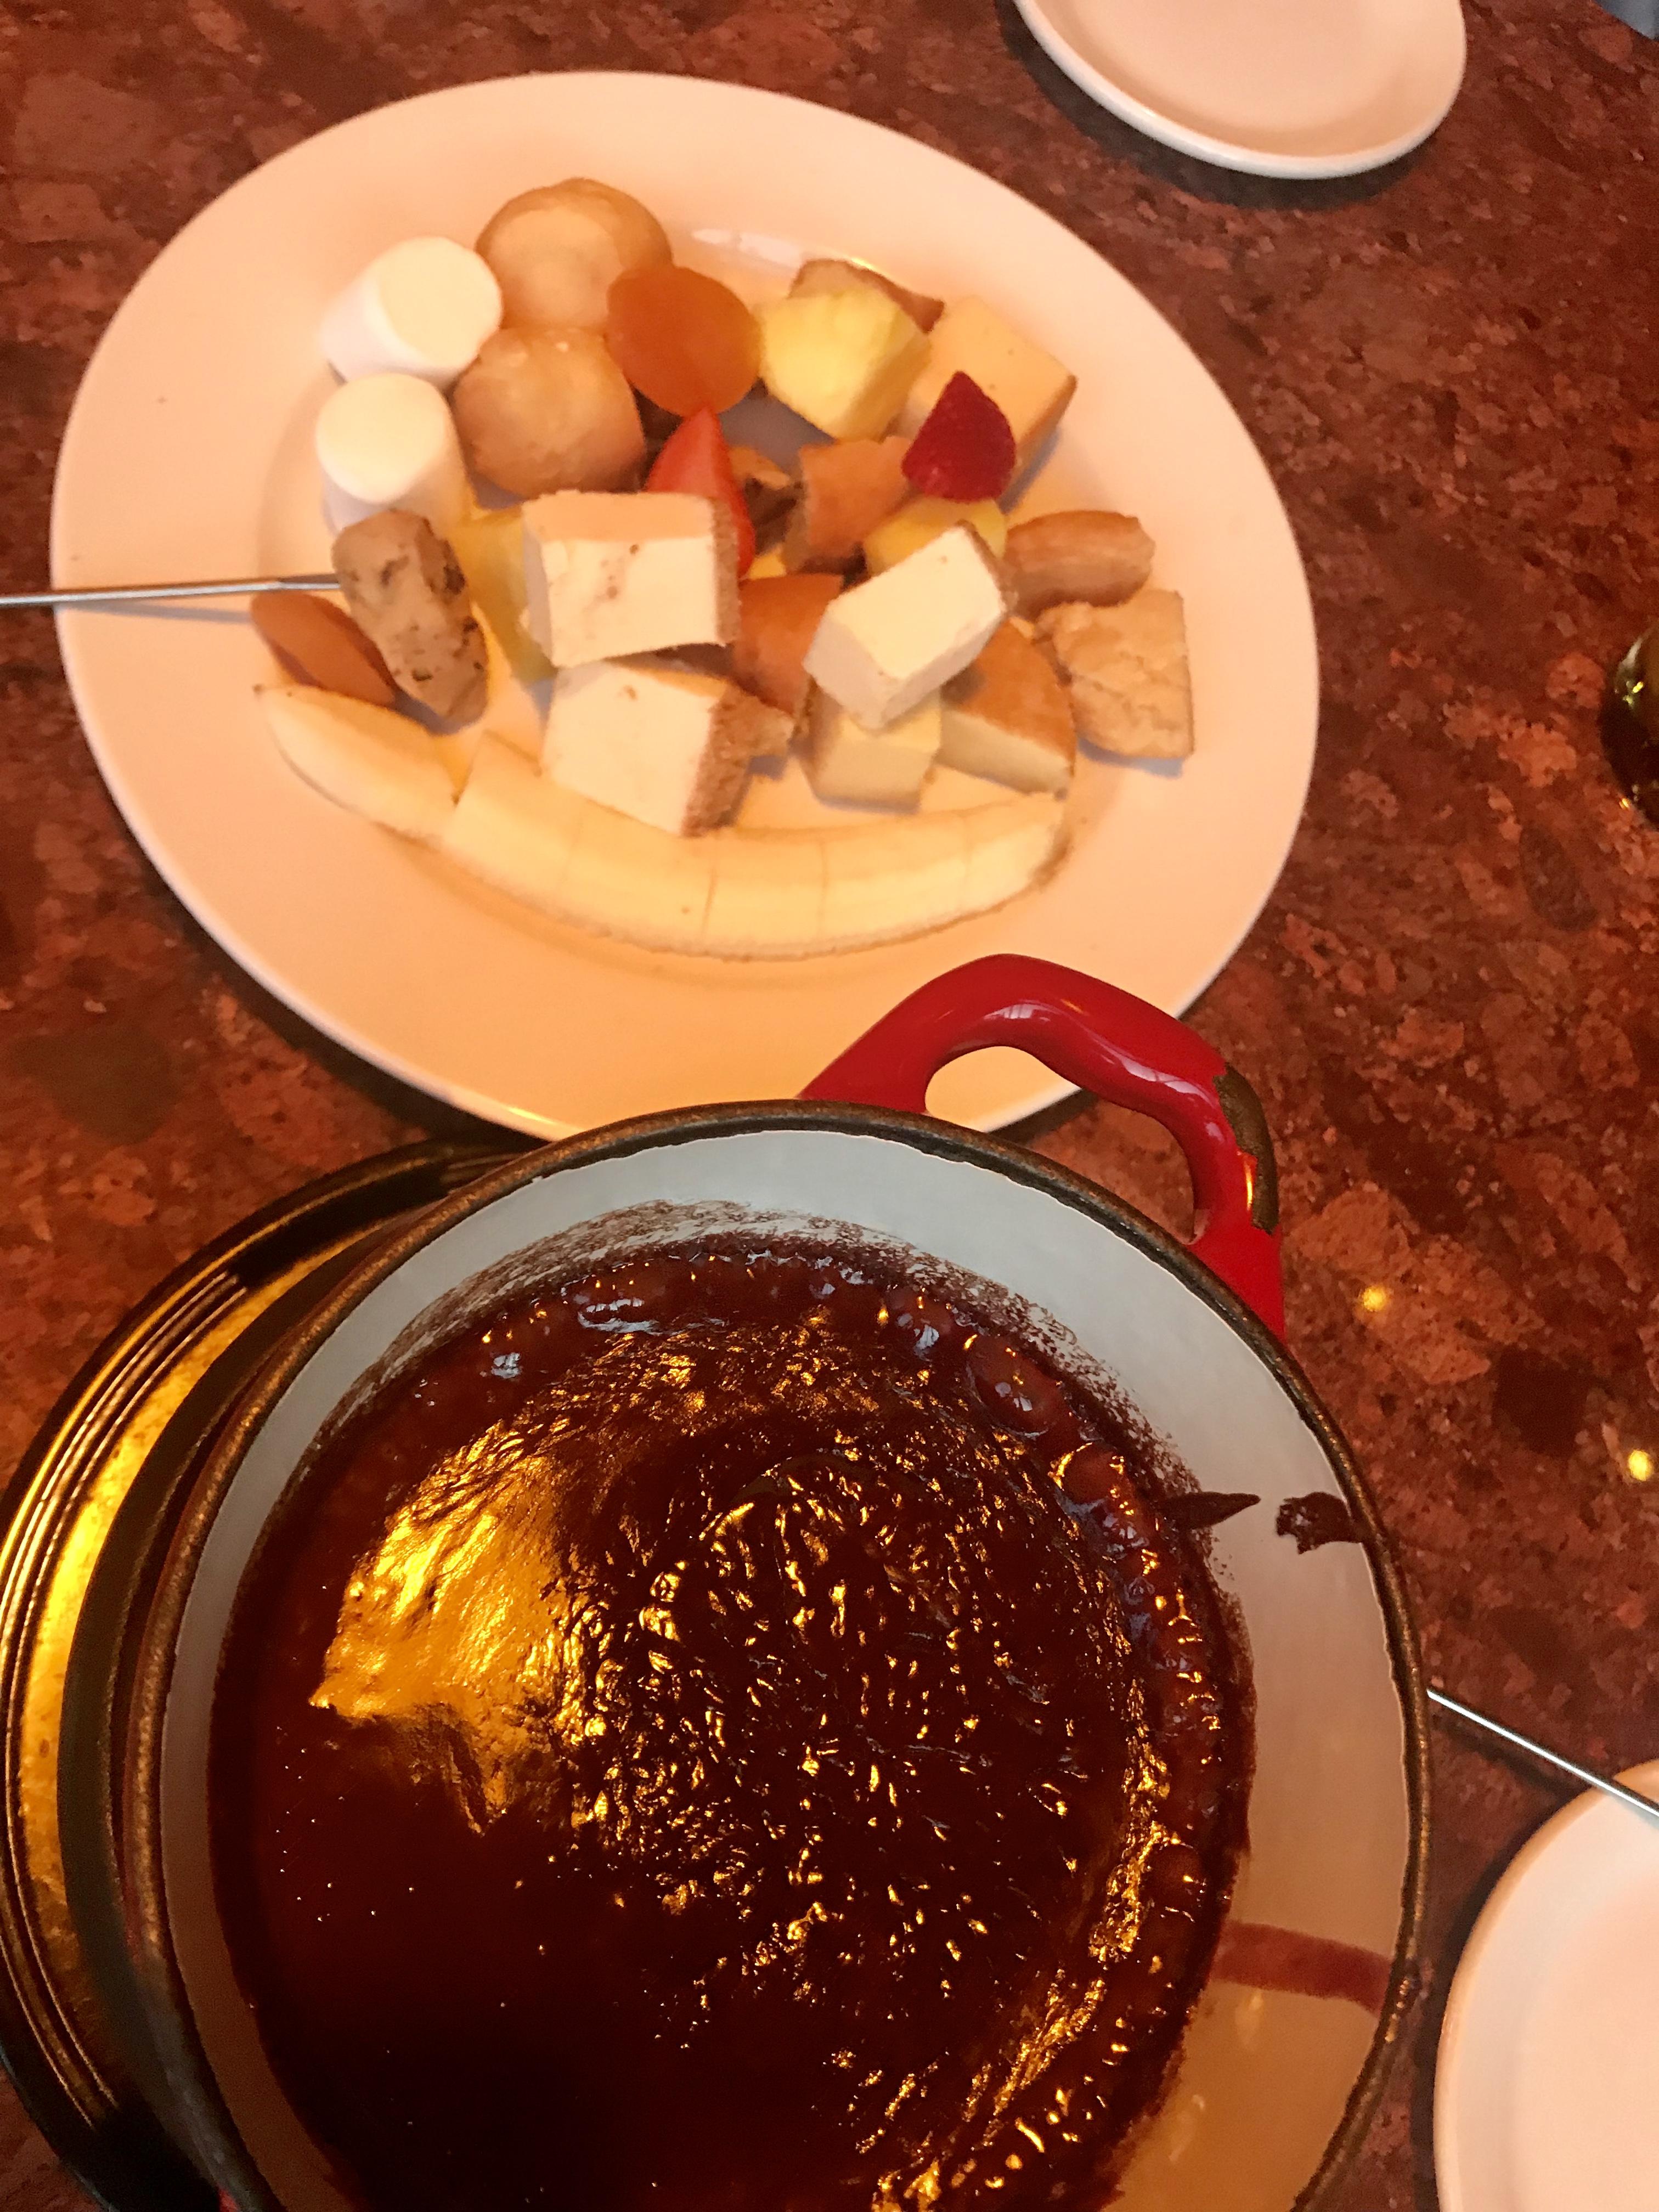 Raspberry Swirls with combo platter for dessert in Urban Fondue in Portland, OR